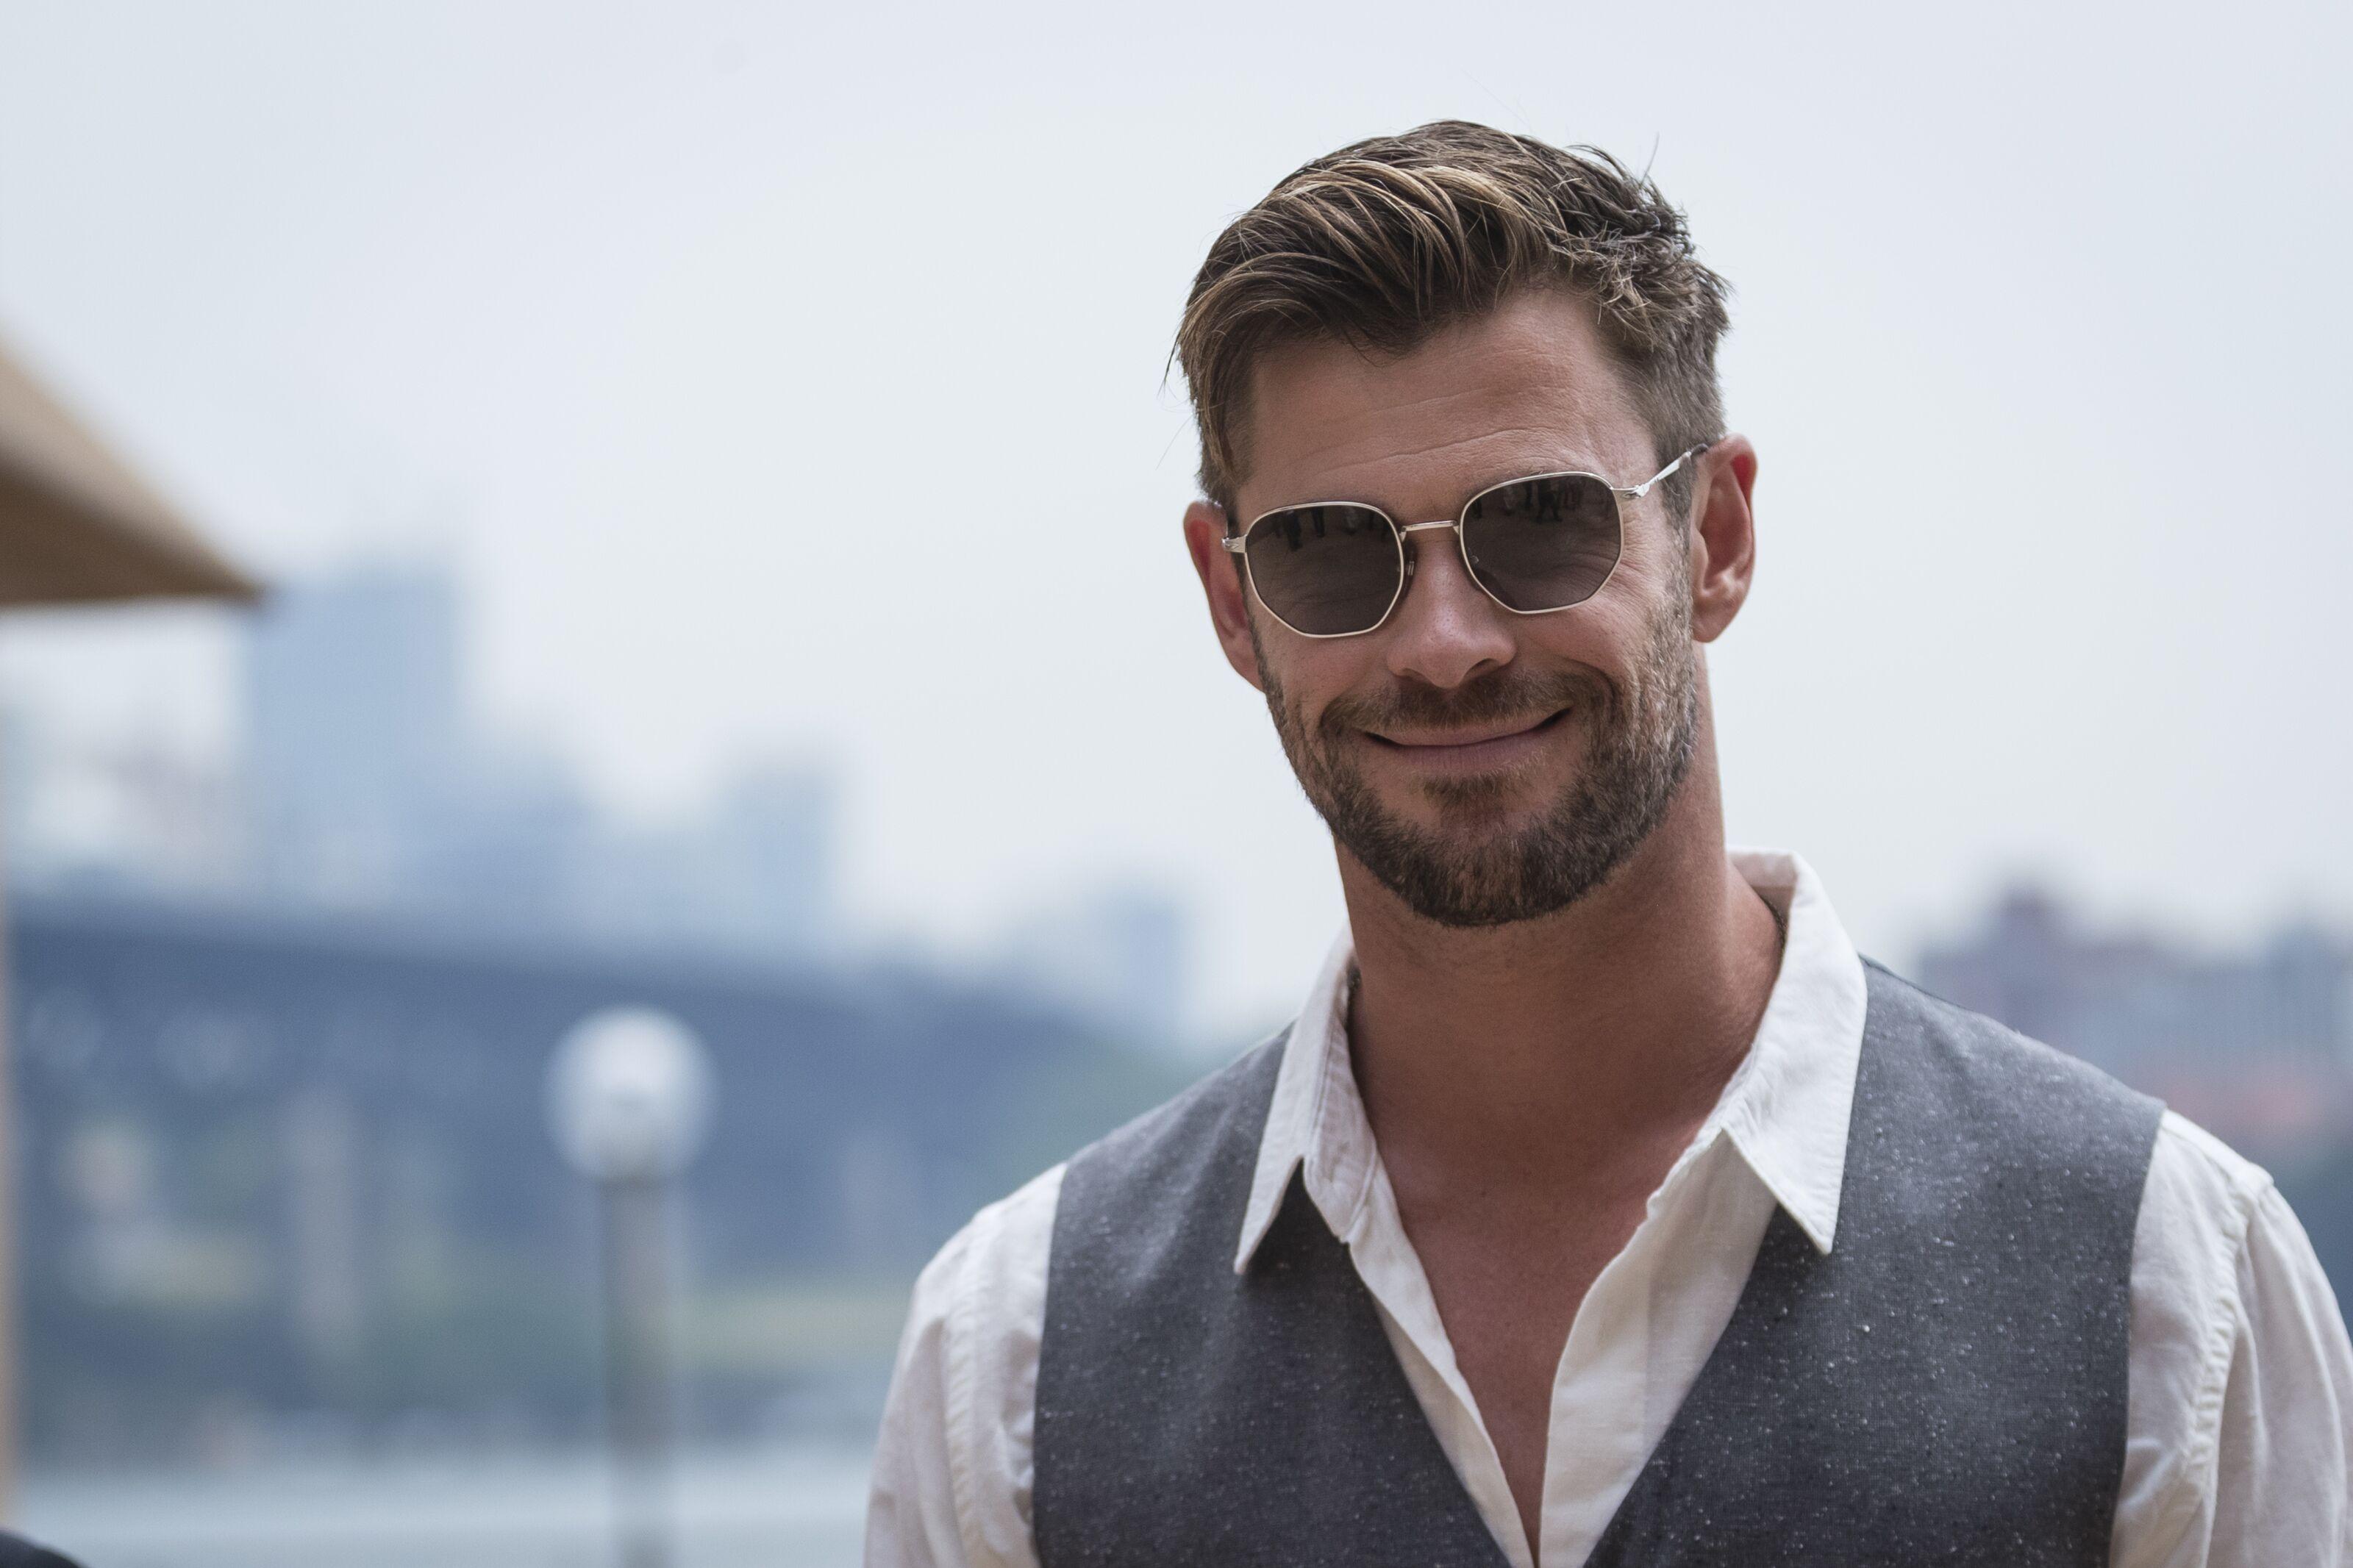 Chris Hemsworth pledges $1 million to Australia to fight devastating fires